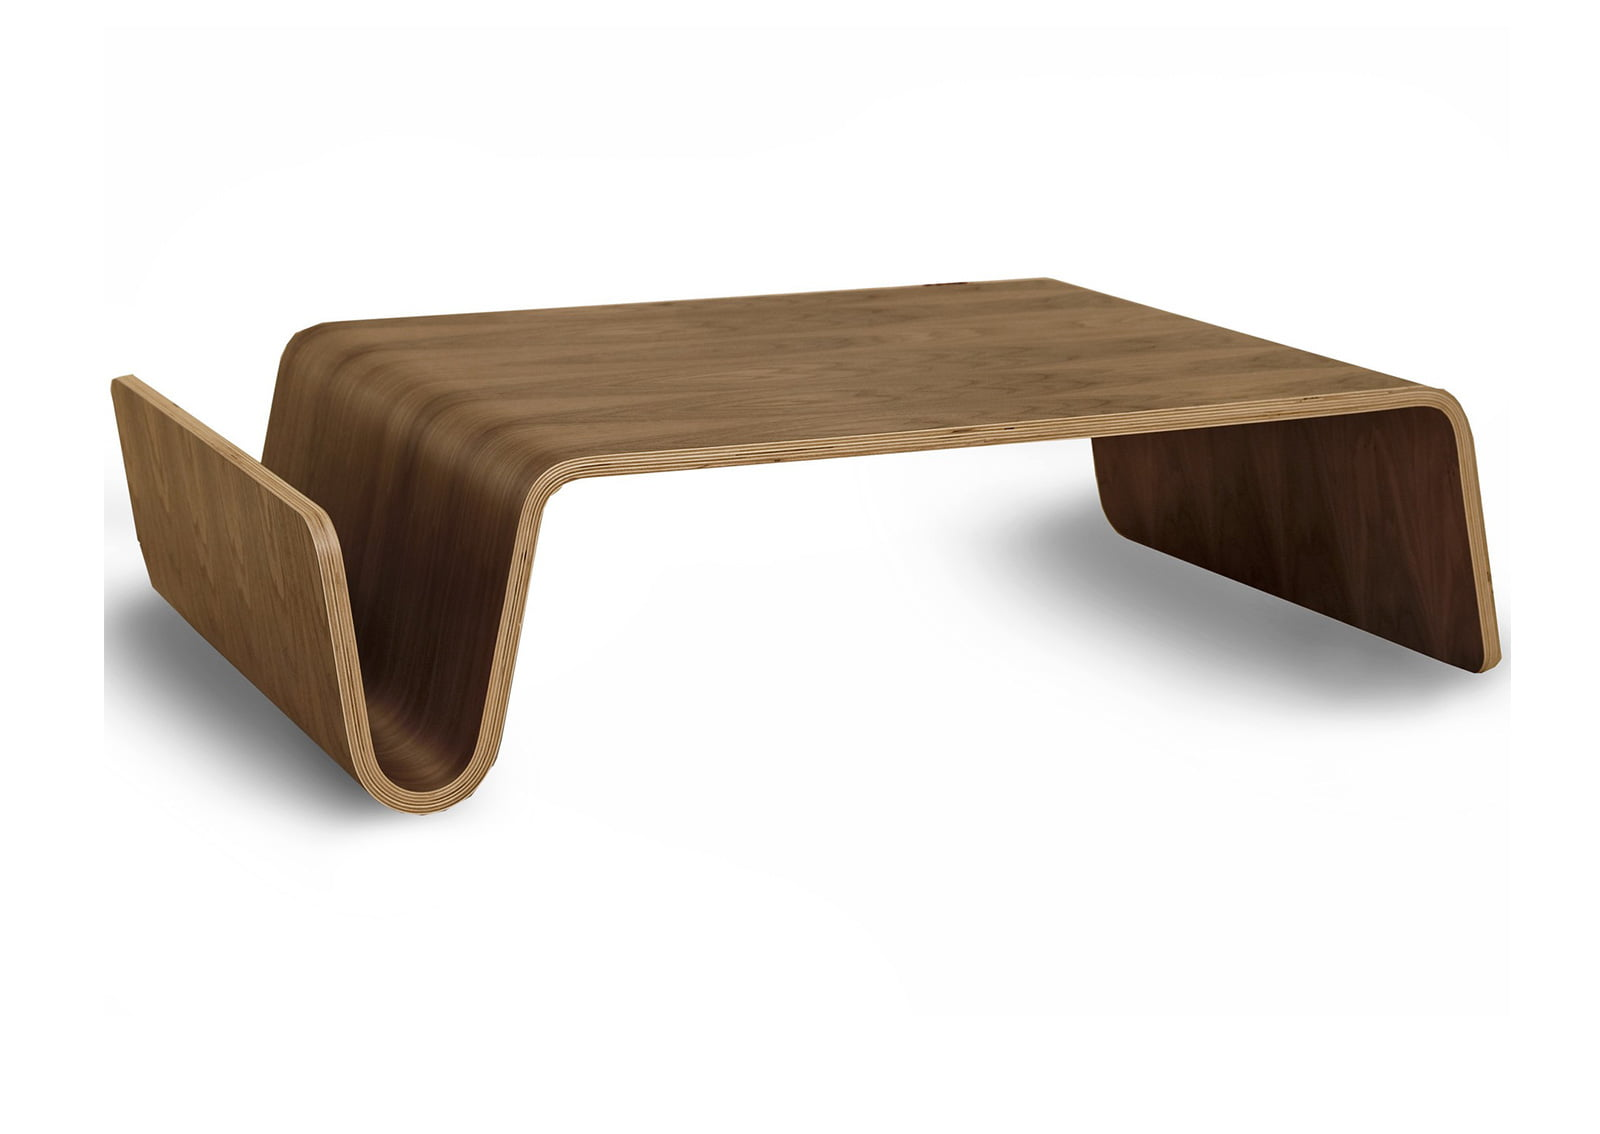 Scando Plywood Coffee Table Furnishplus